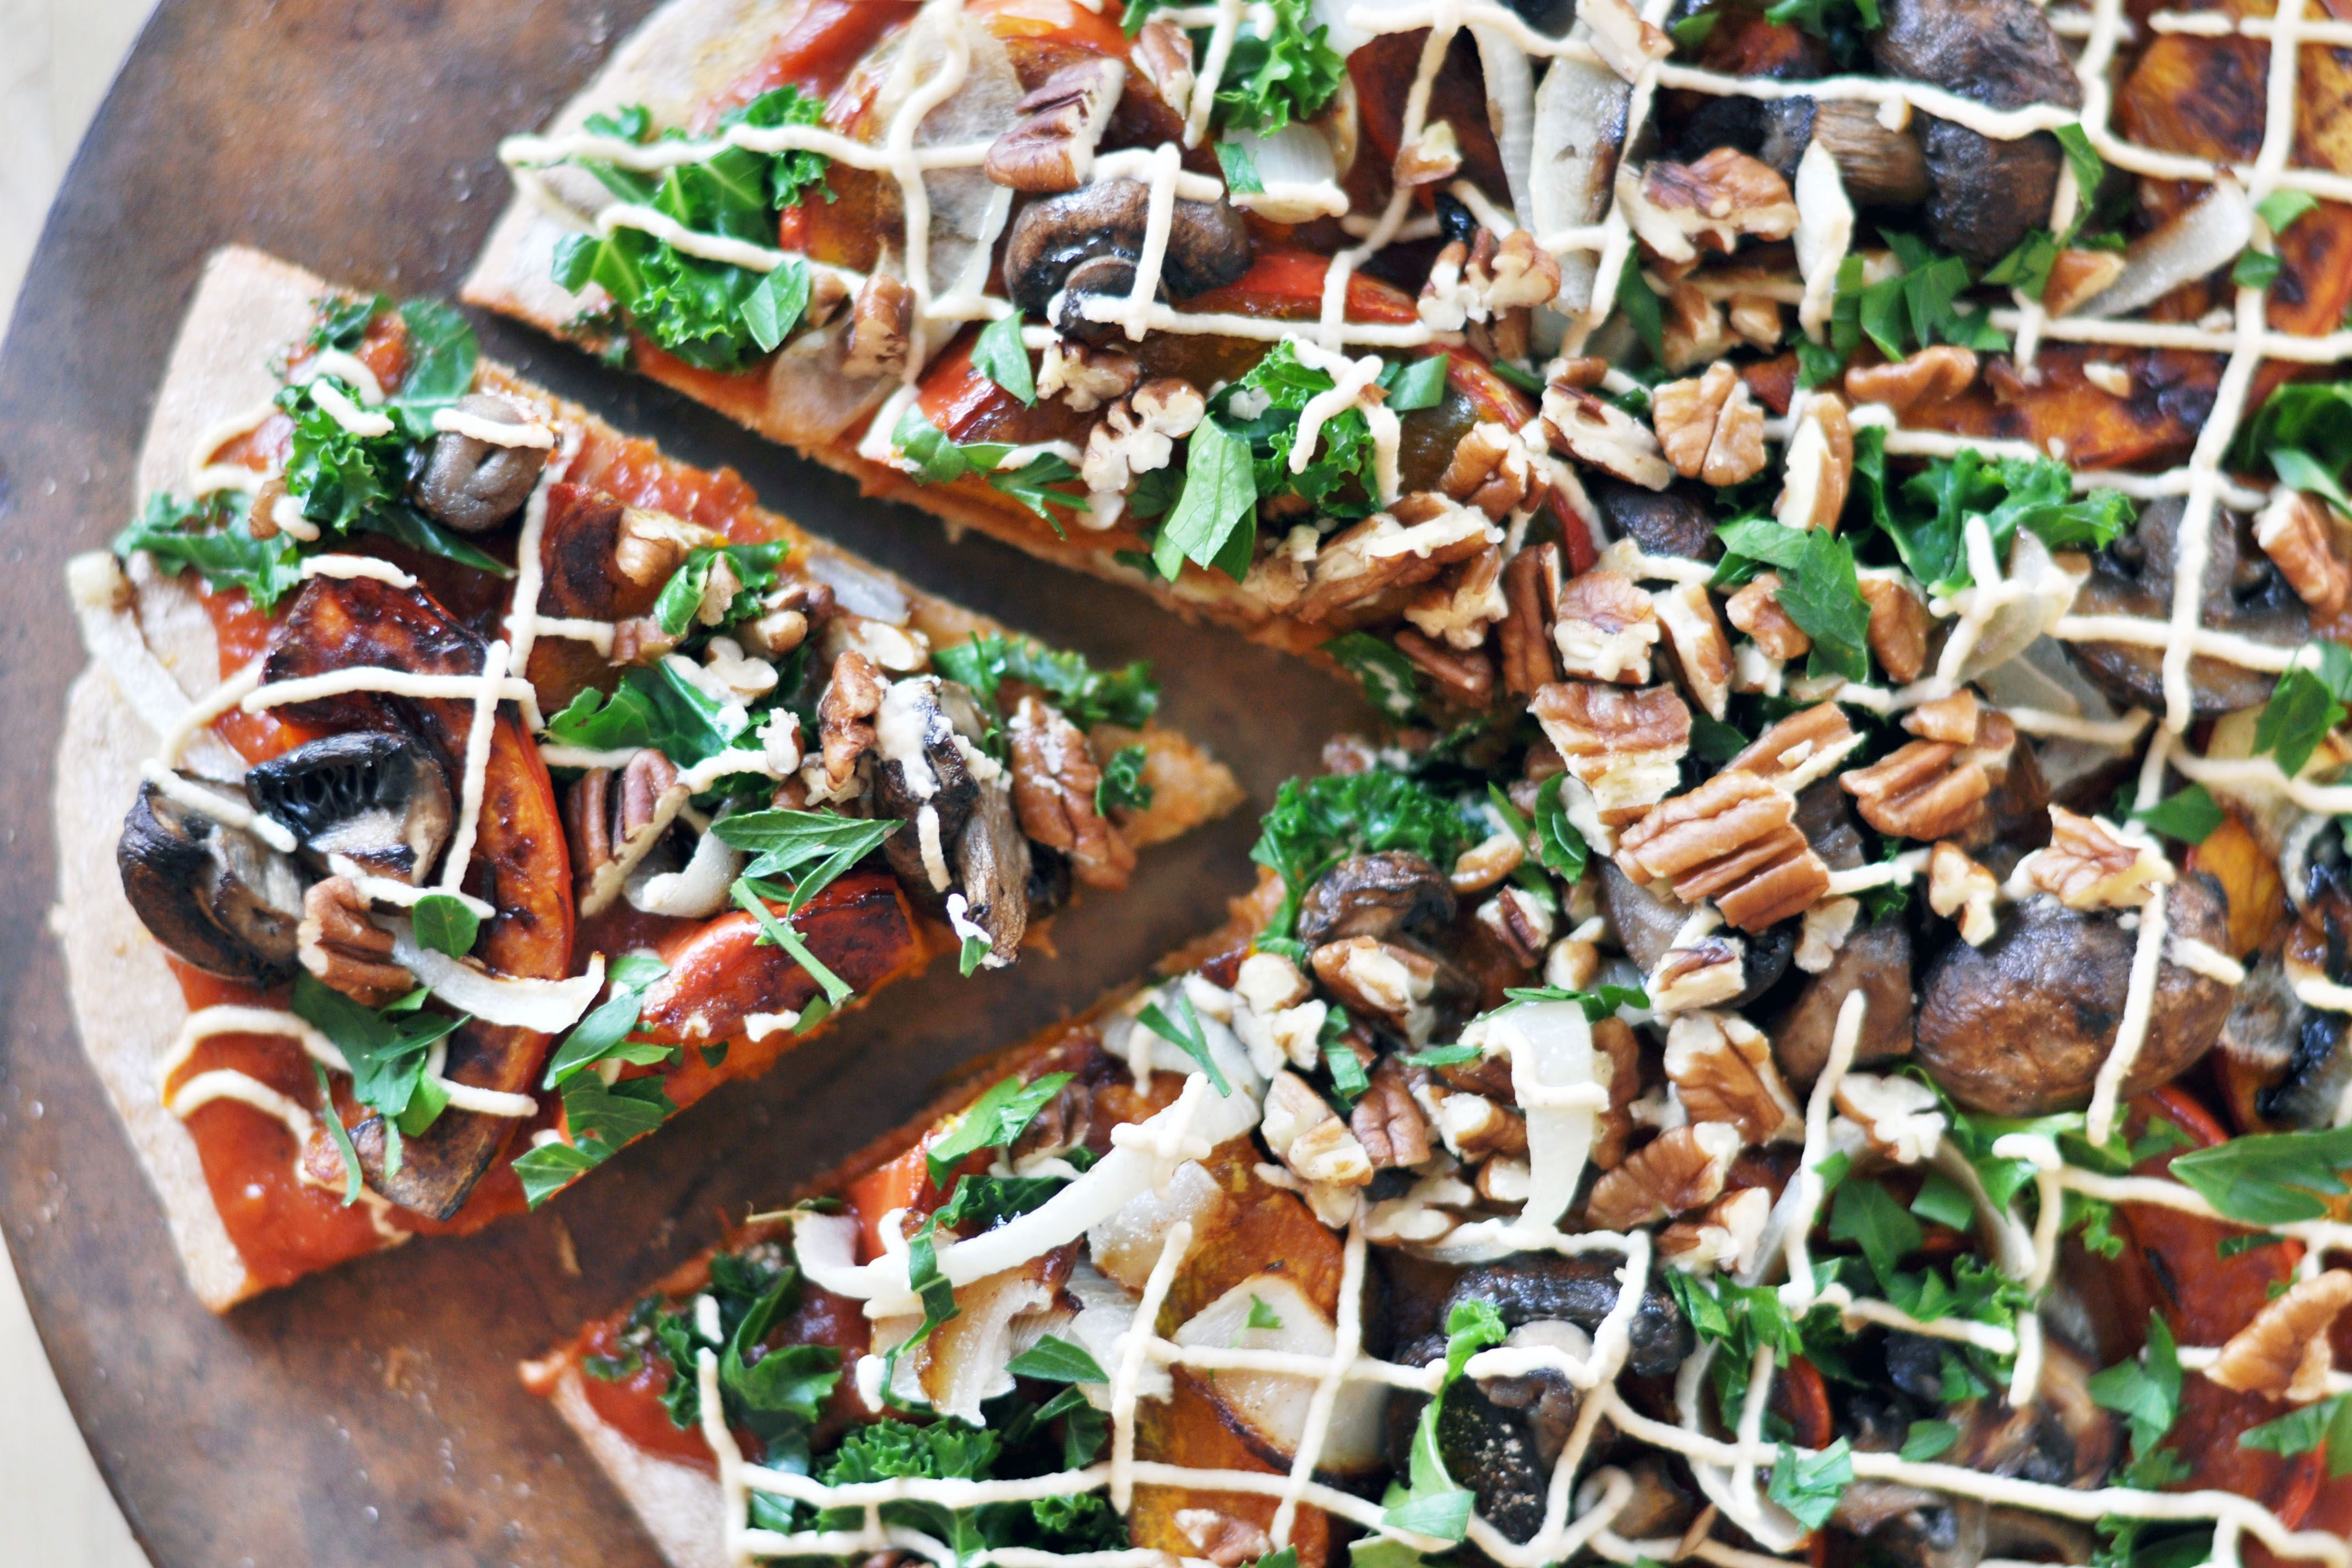 Vegan Harvest Pizza with Cashew Cheese- kabocha squash, kale, onions, mushrooms, pizza sauce, parsley, walnuts.